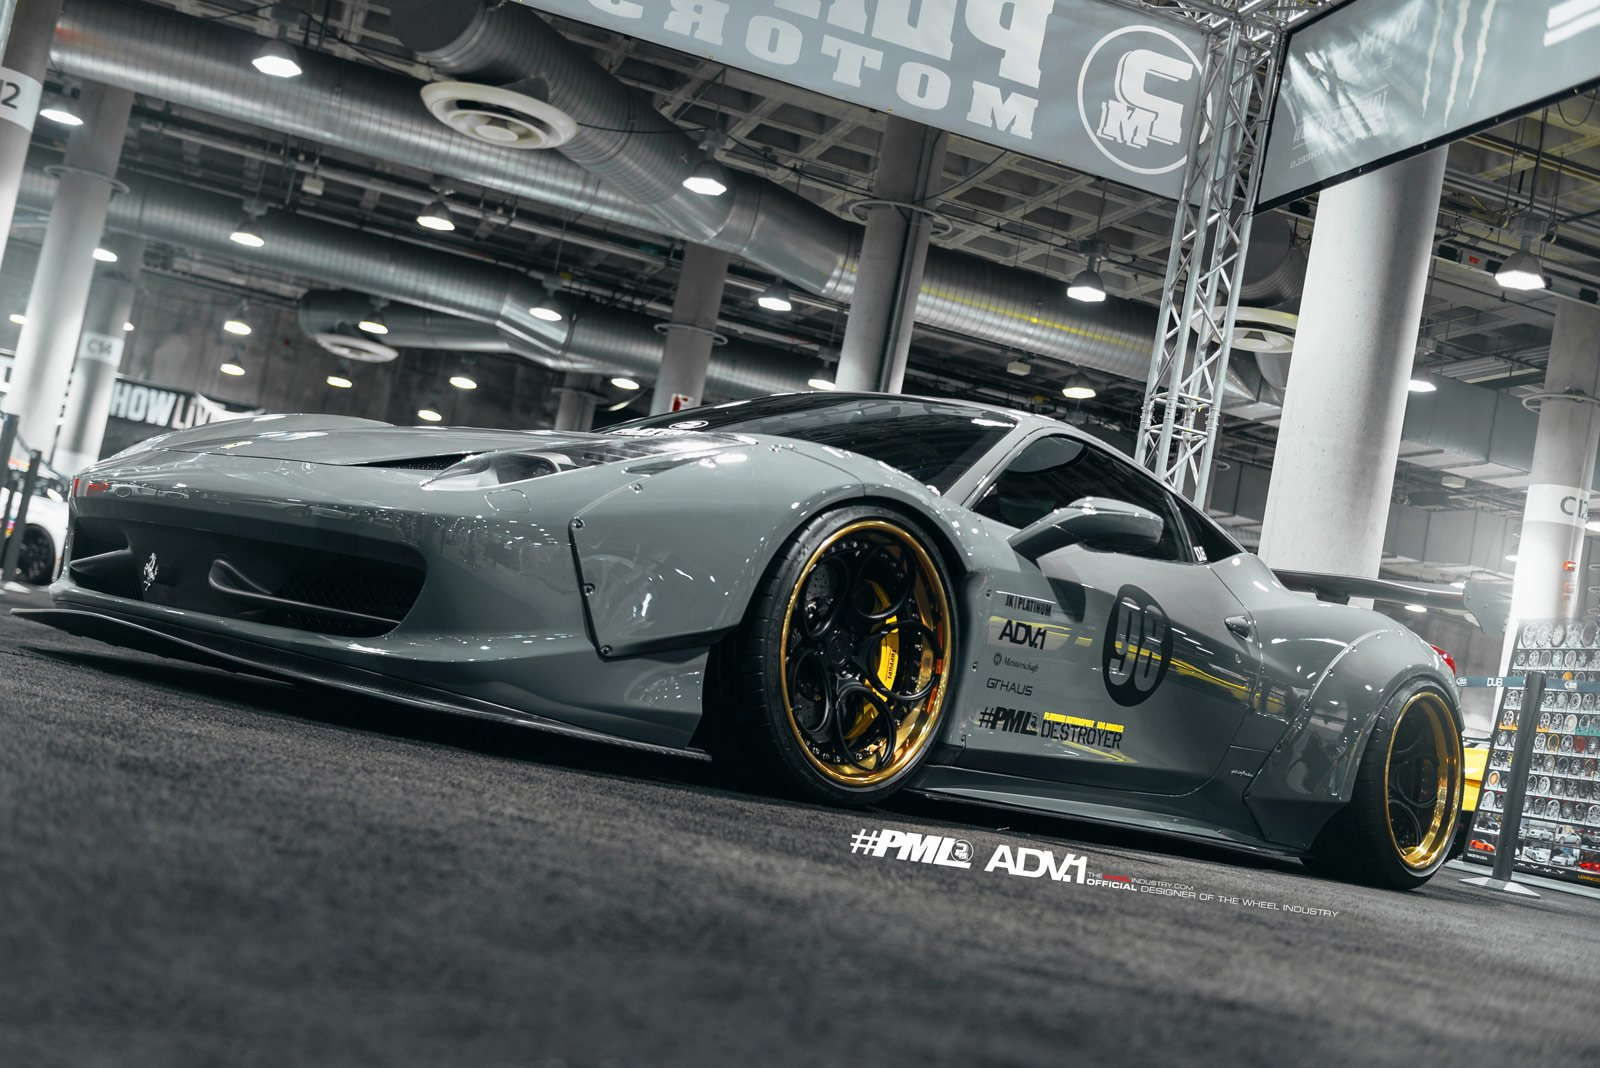 Adv1 Wheels Ferrari 458 Platinum Liberty Walk Suv Tuning Cars Wallpaper 1600x1068 542632 Wallpaperup